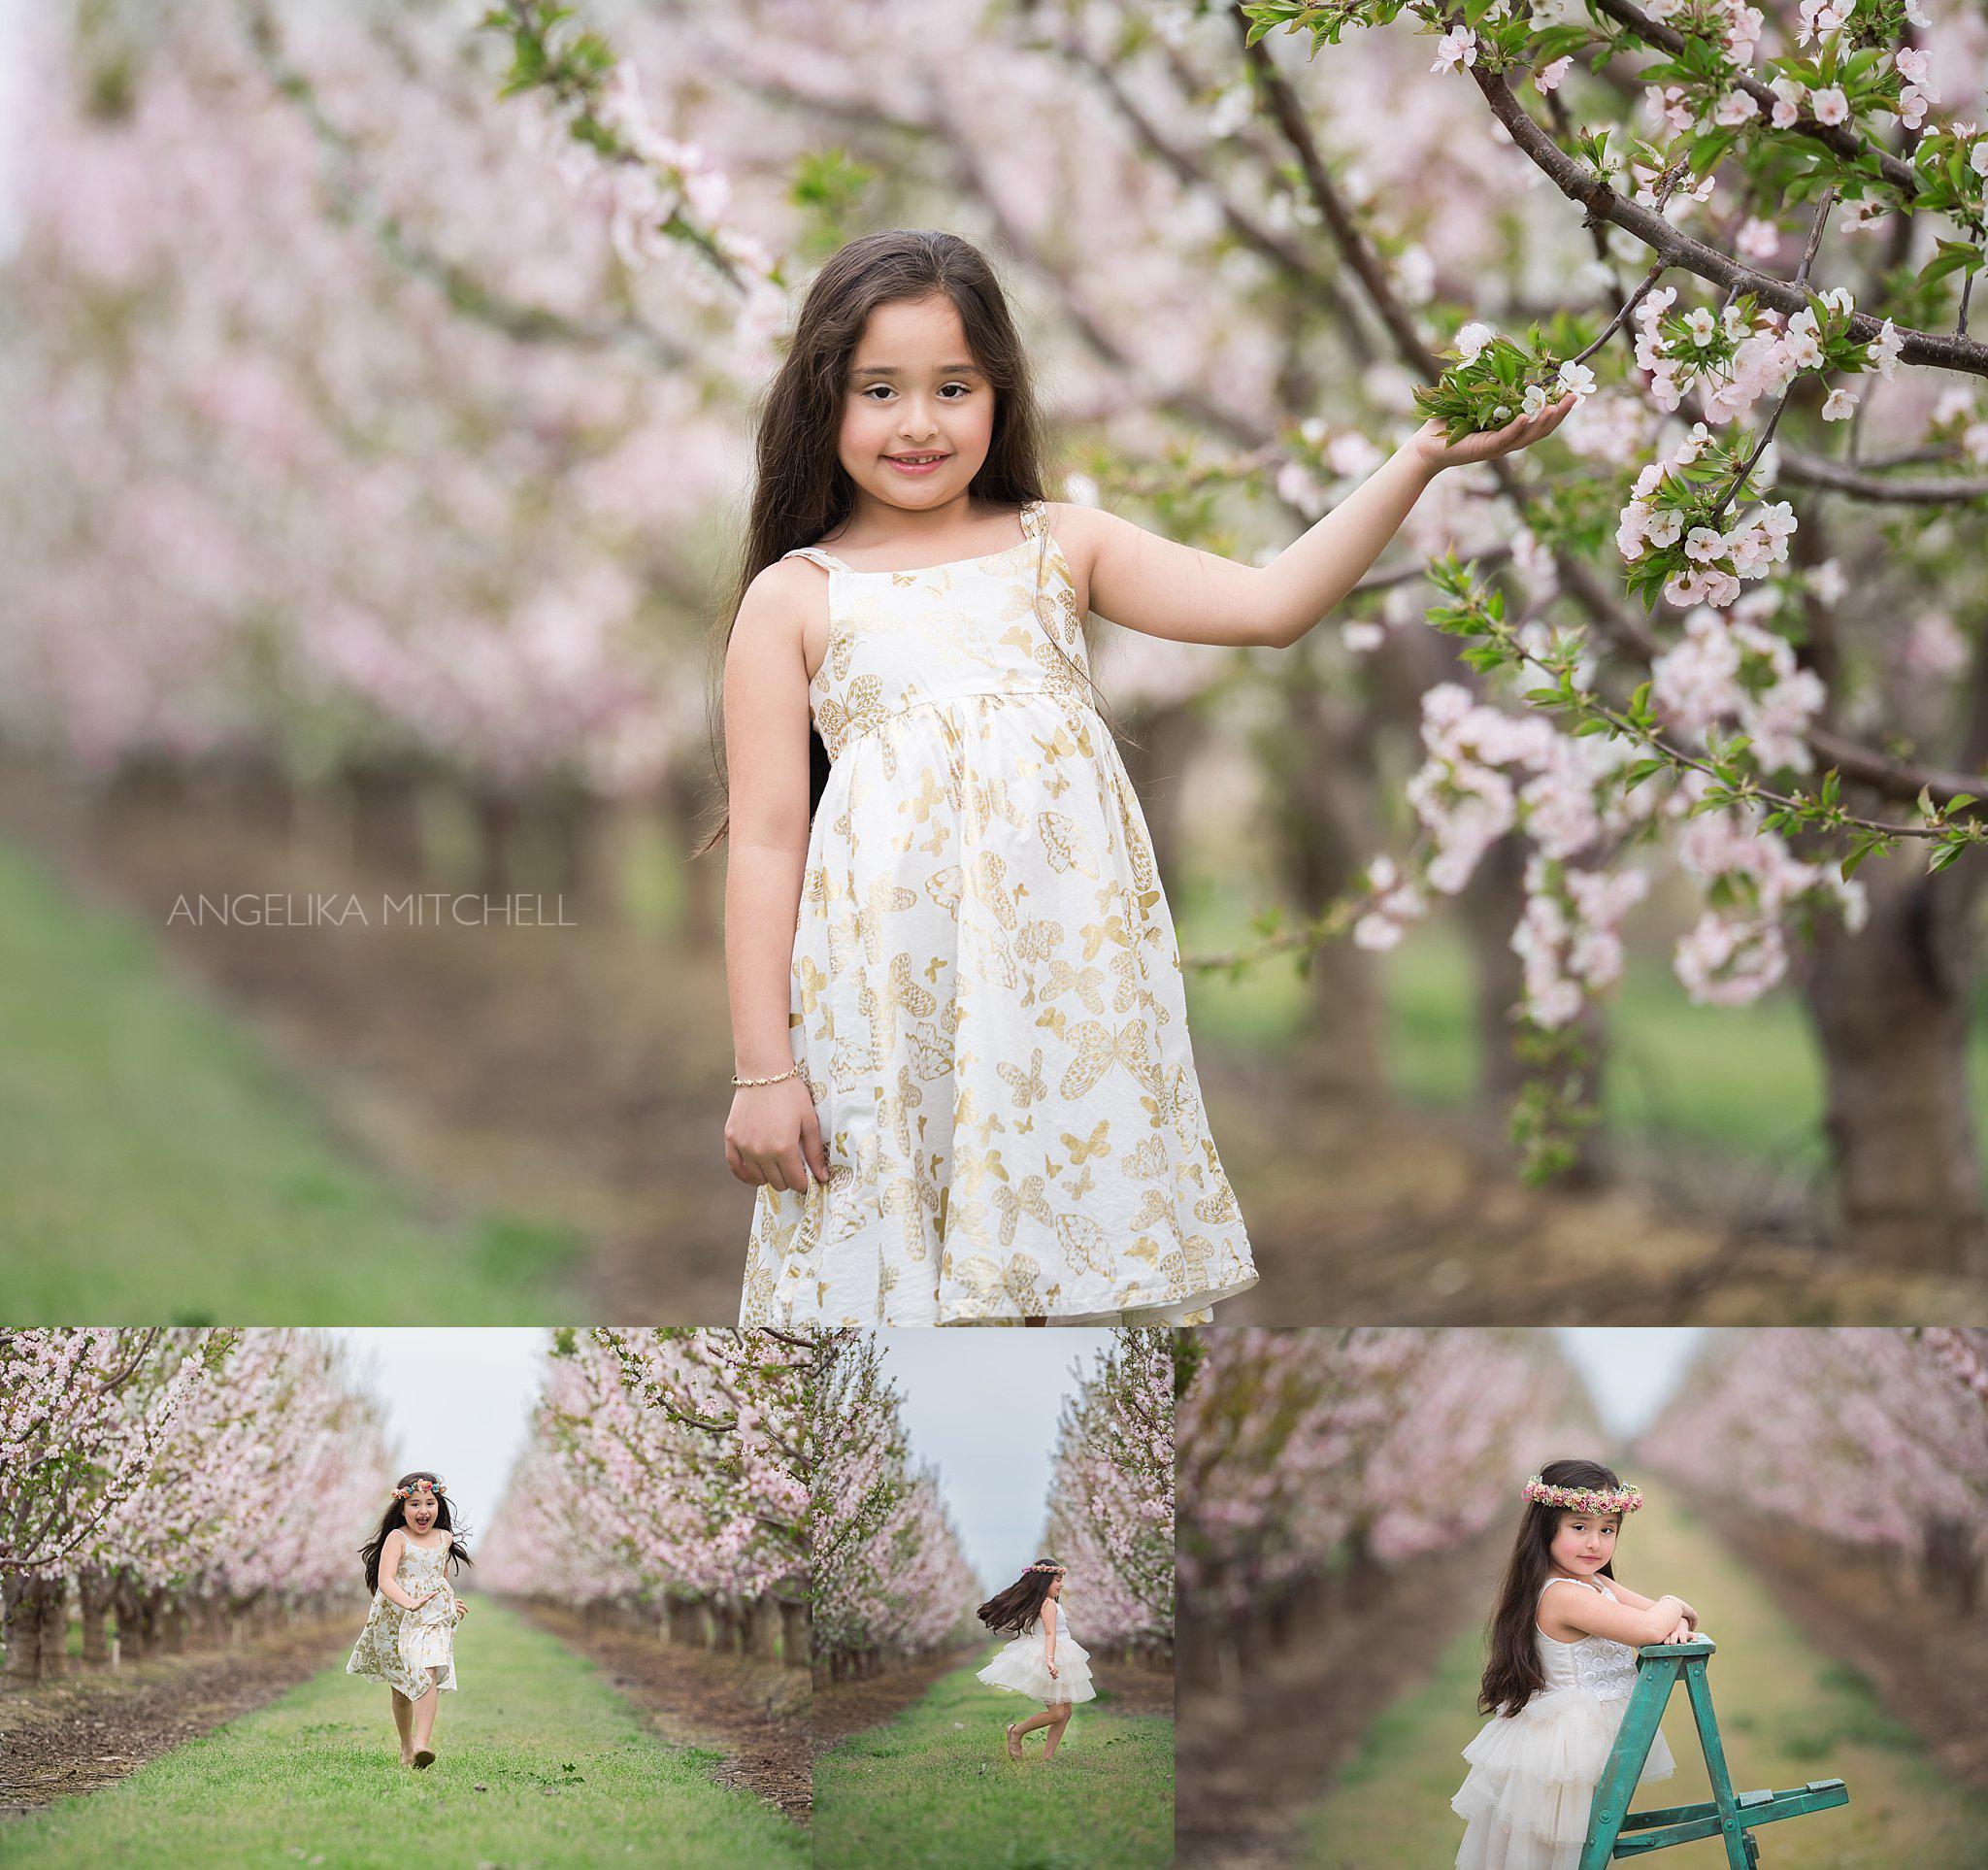 Cherry Blossom Portrail- Angelika Mitchell Photography- Santa Rosa